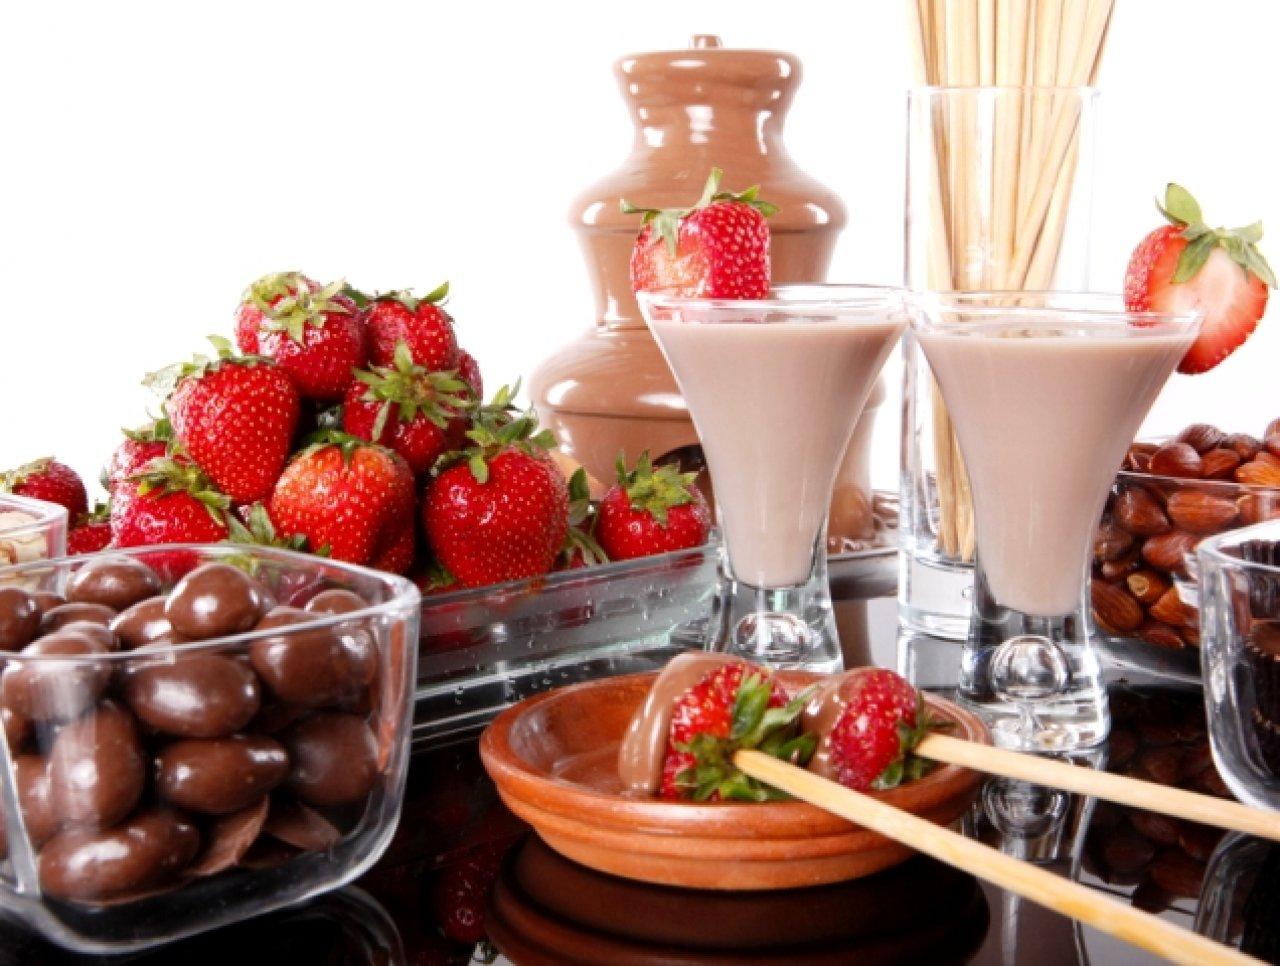 Клубника превосходно оттеняет вкус шоколада